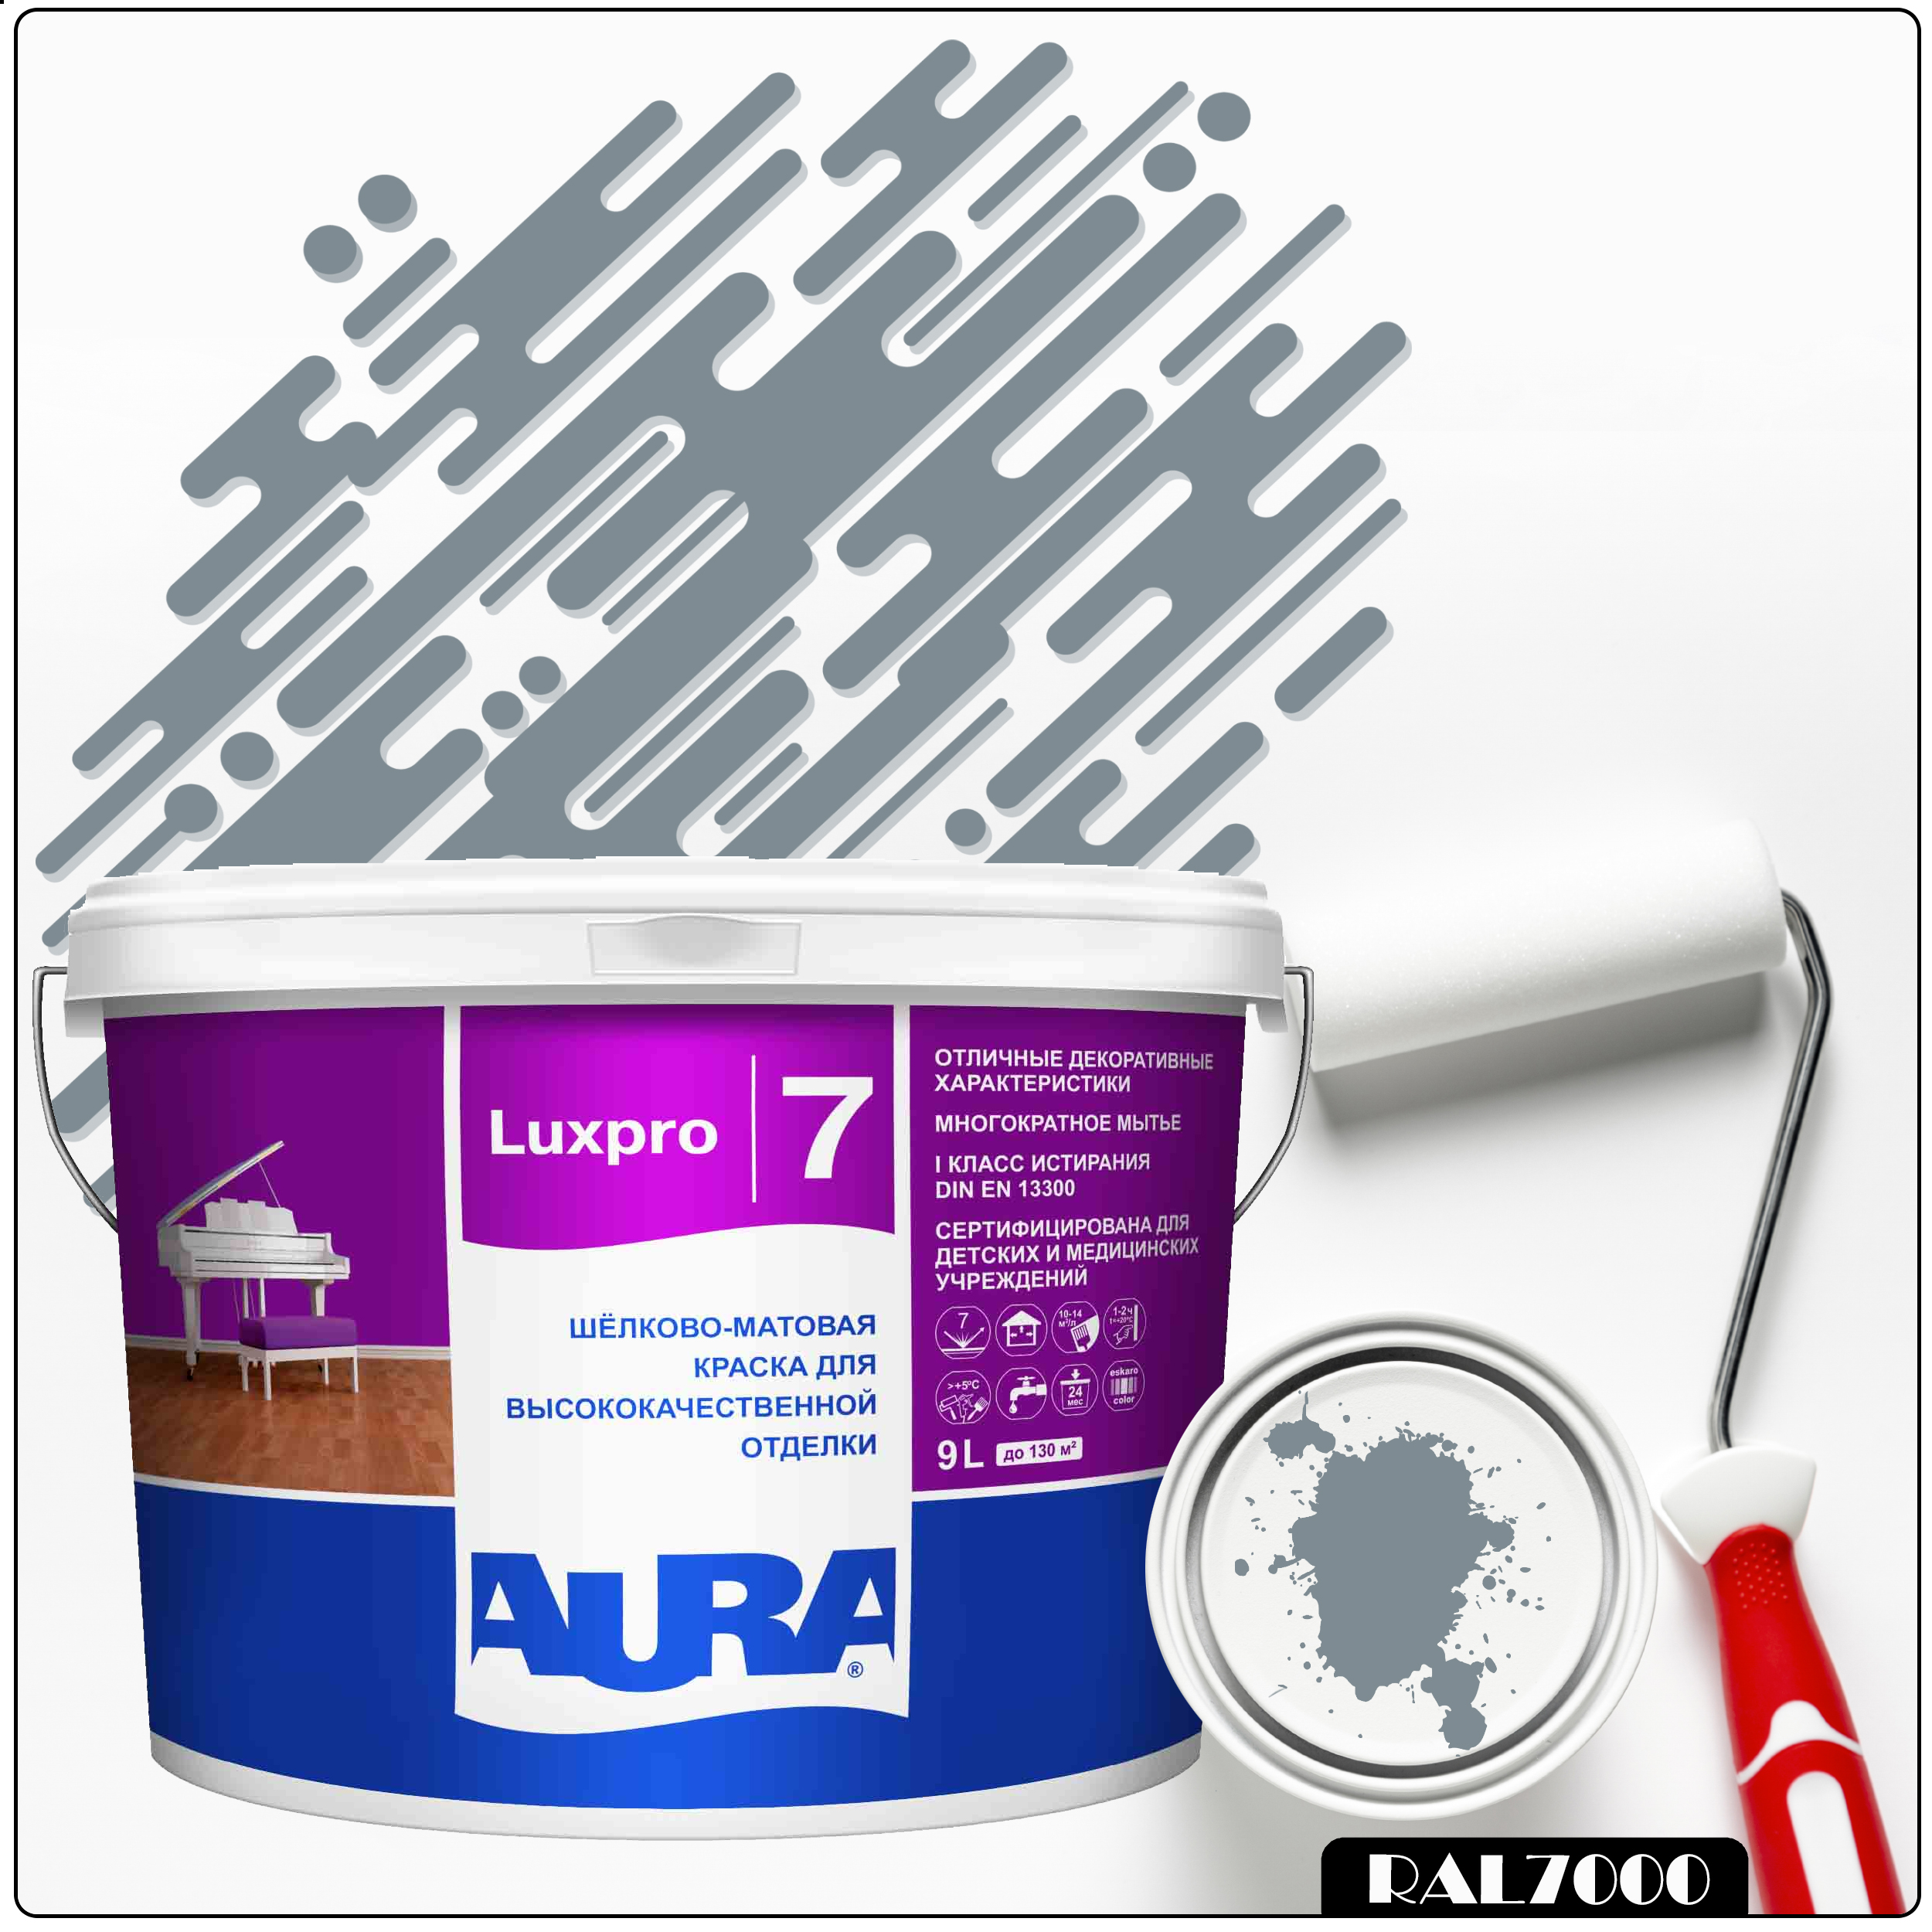 Фото 1 - Краска Aura LuxPRO 7, RAL 7000 Серая белка, латексная, шелково-матовая, интерьерная, 9л, Аура.